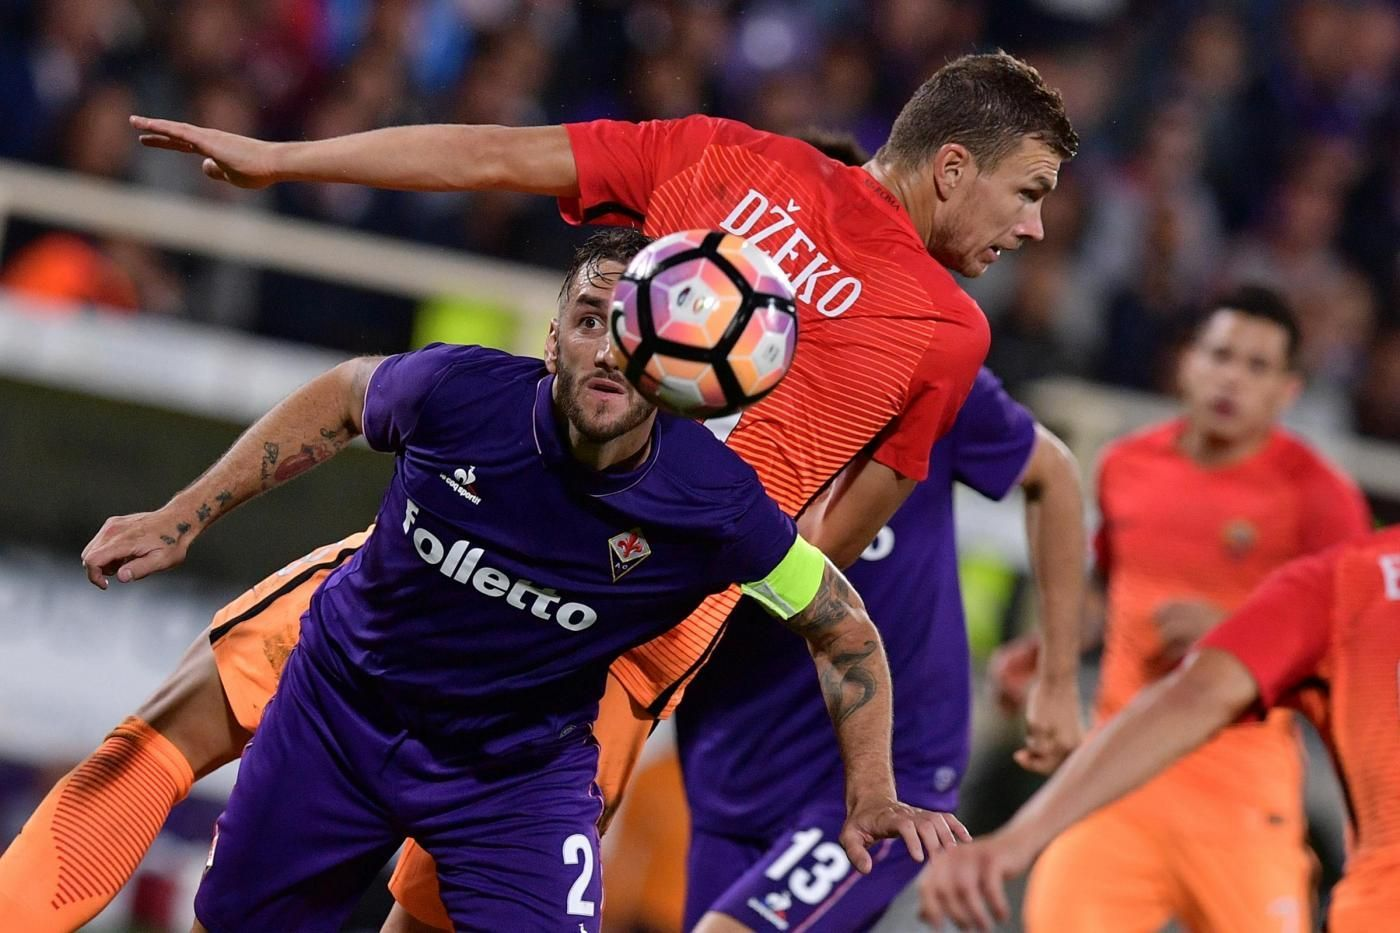 Sorteggi sedicesimi Europa League: Villarreal-Roma, Gladbach-Fiorentina